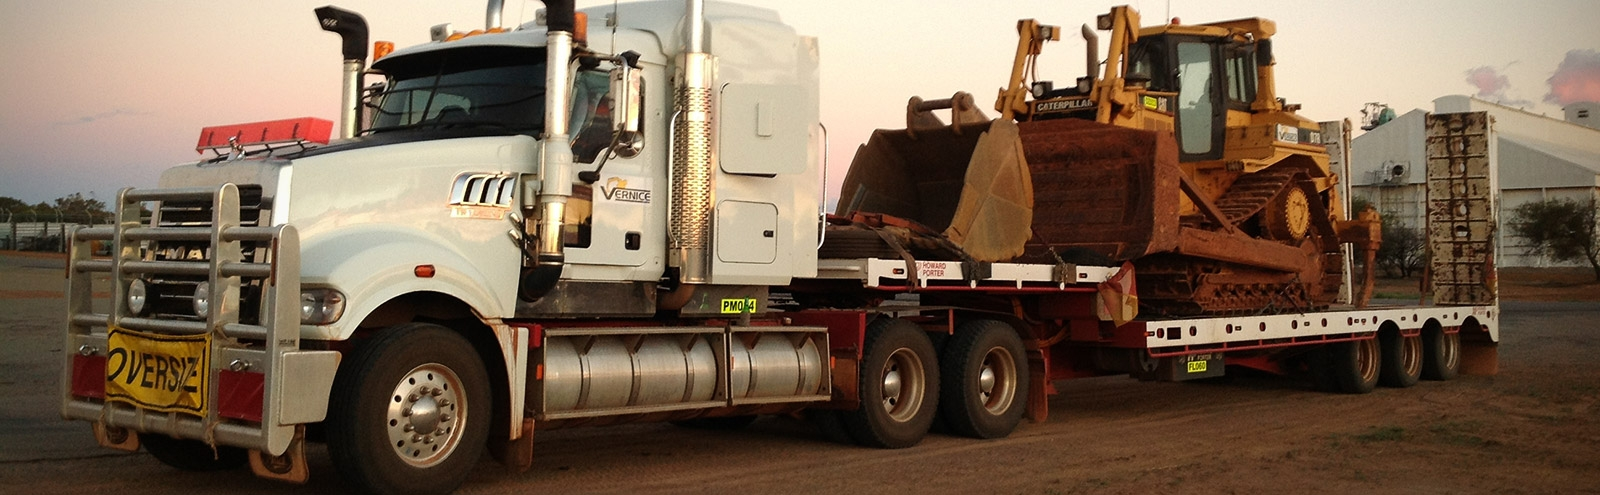 Truck Float with Dozer